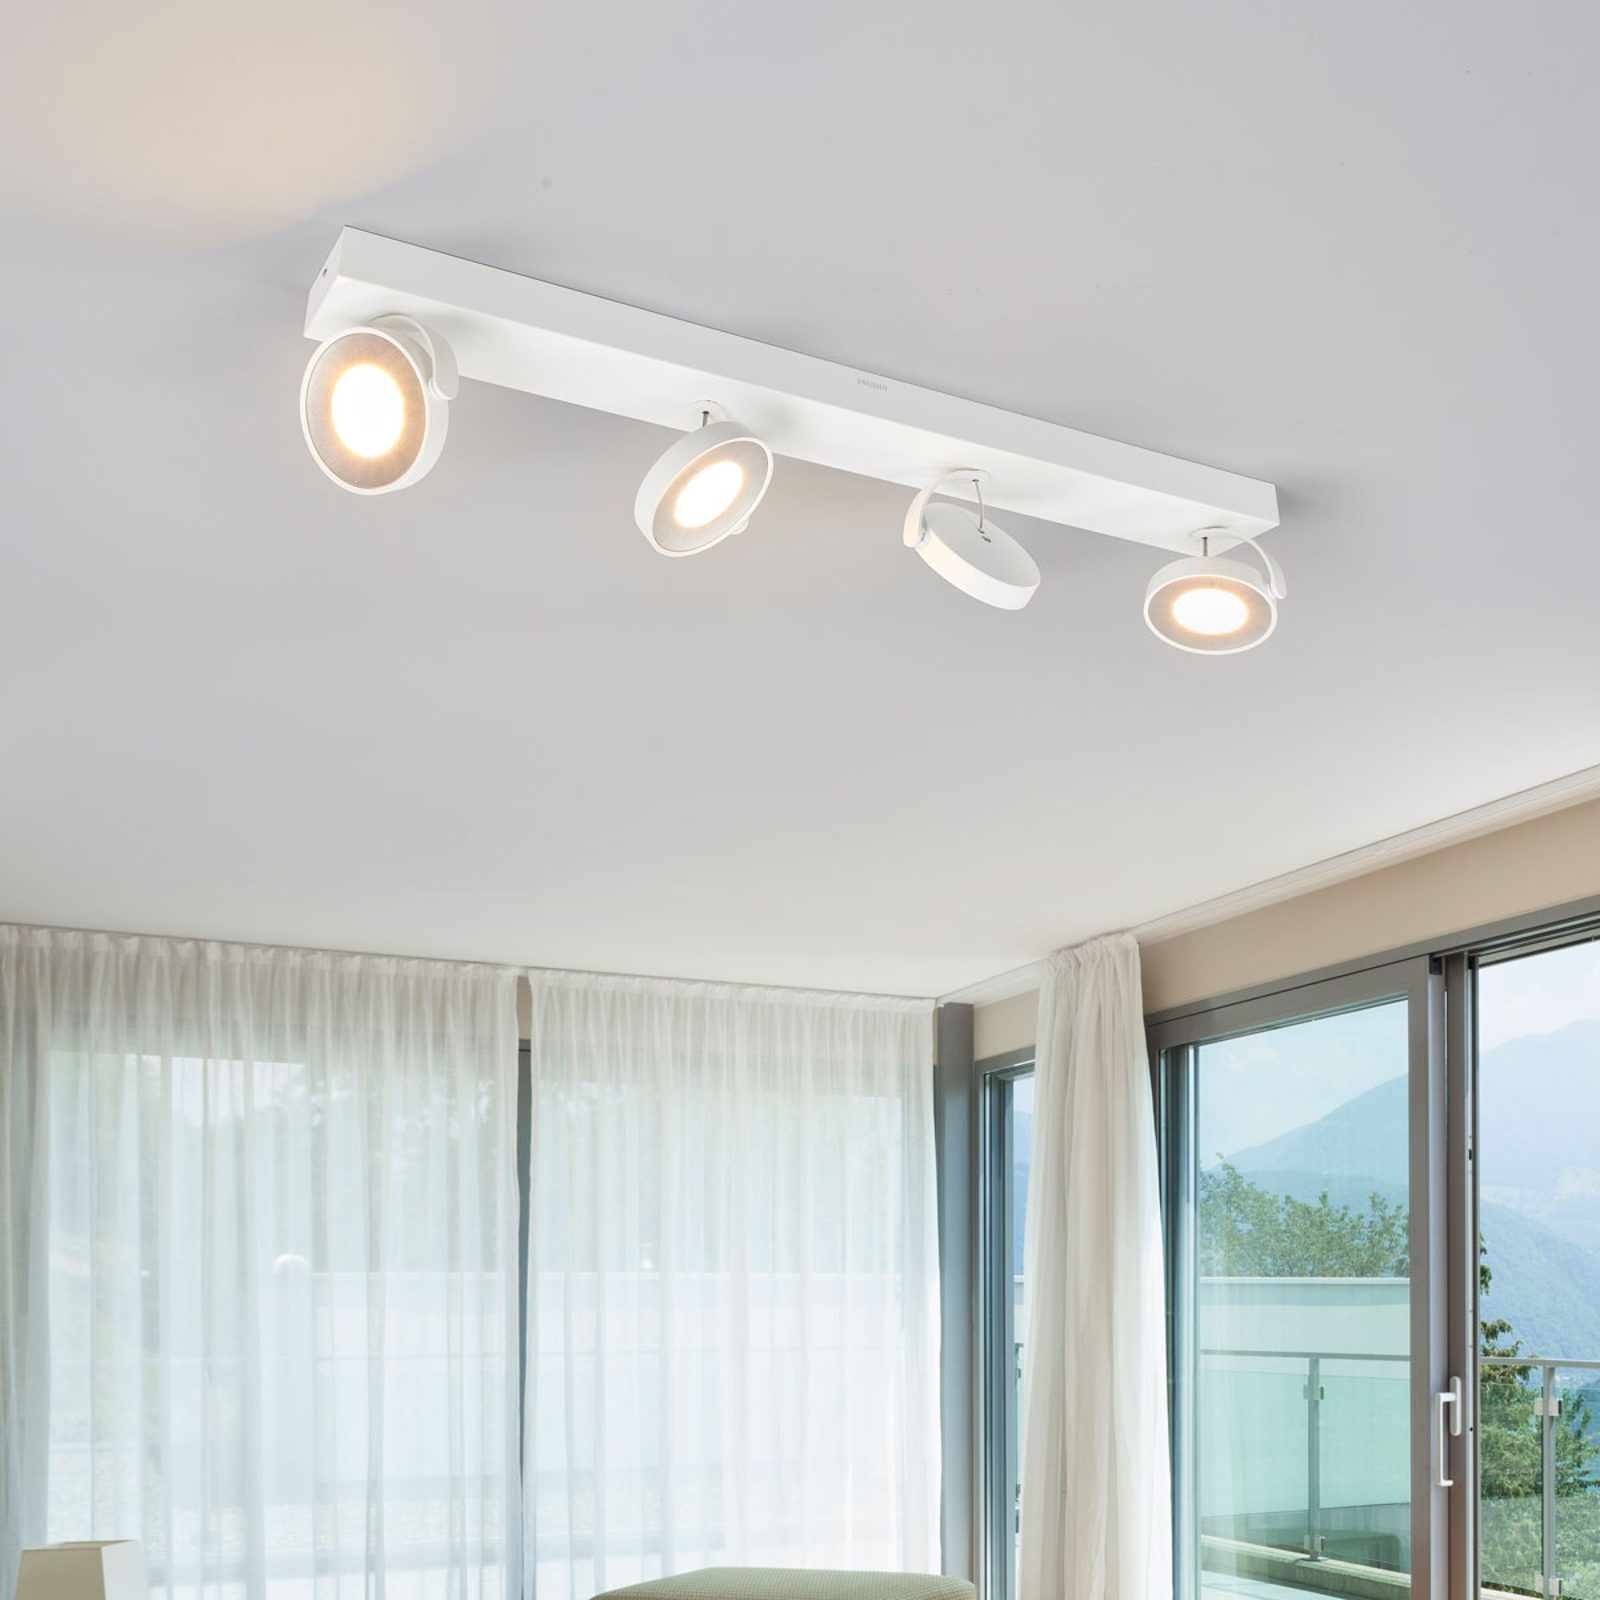 Spot de plafond LED Clockwork blanc